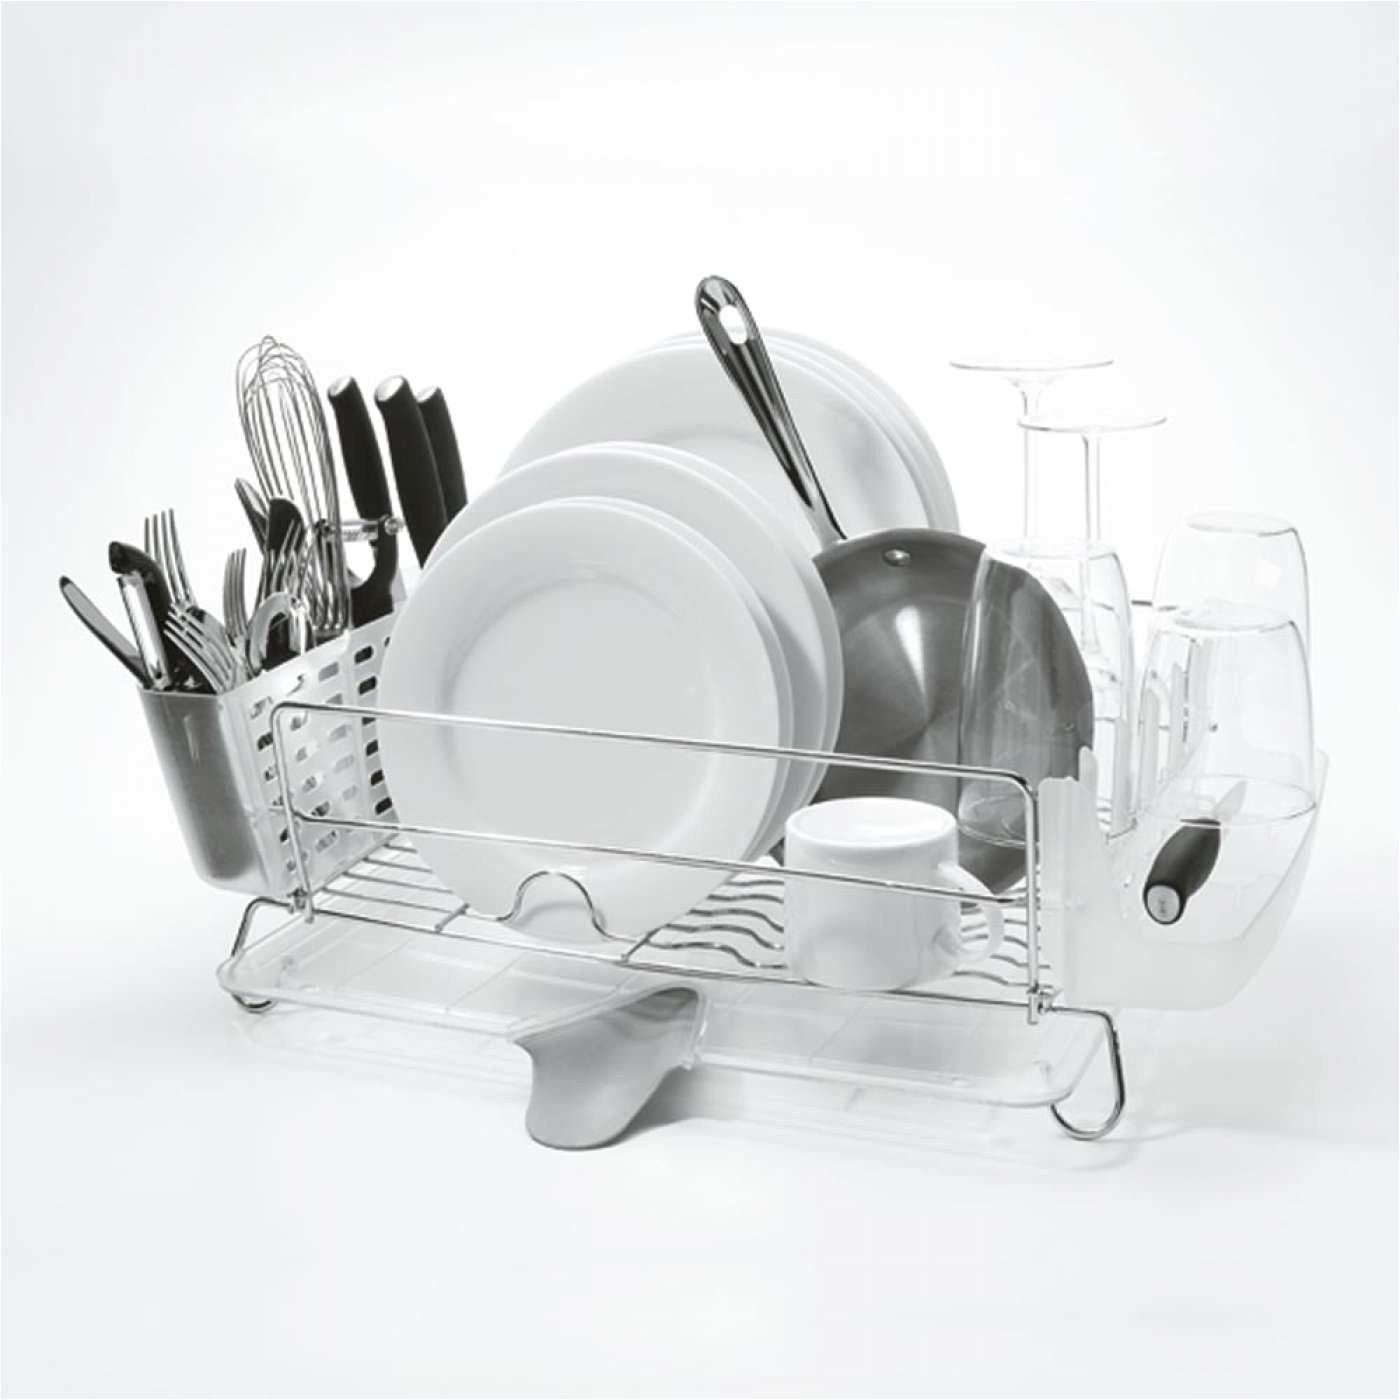 oxo good grips stainless steel dish drying rack 1069916 full of dishes 1 jpg